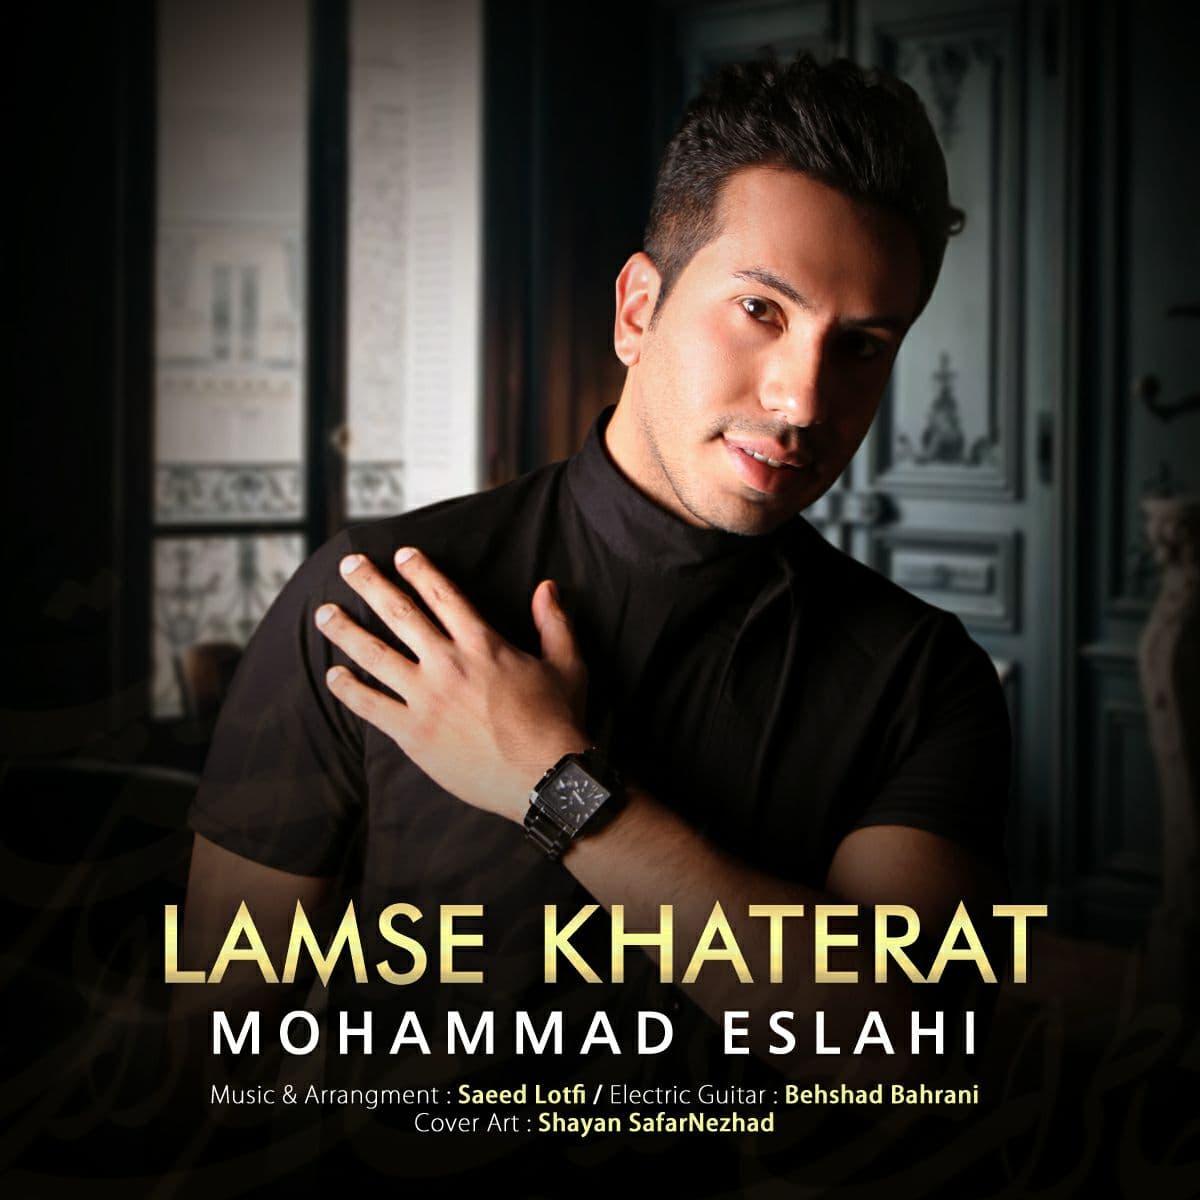 Mohammad Eslahi – Lamse Khaterat